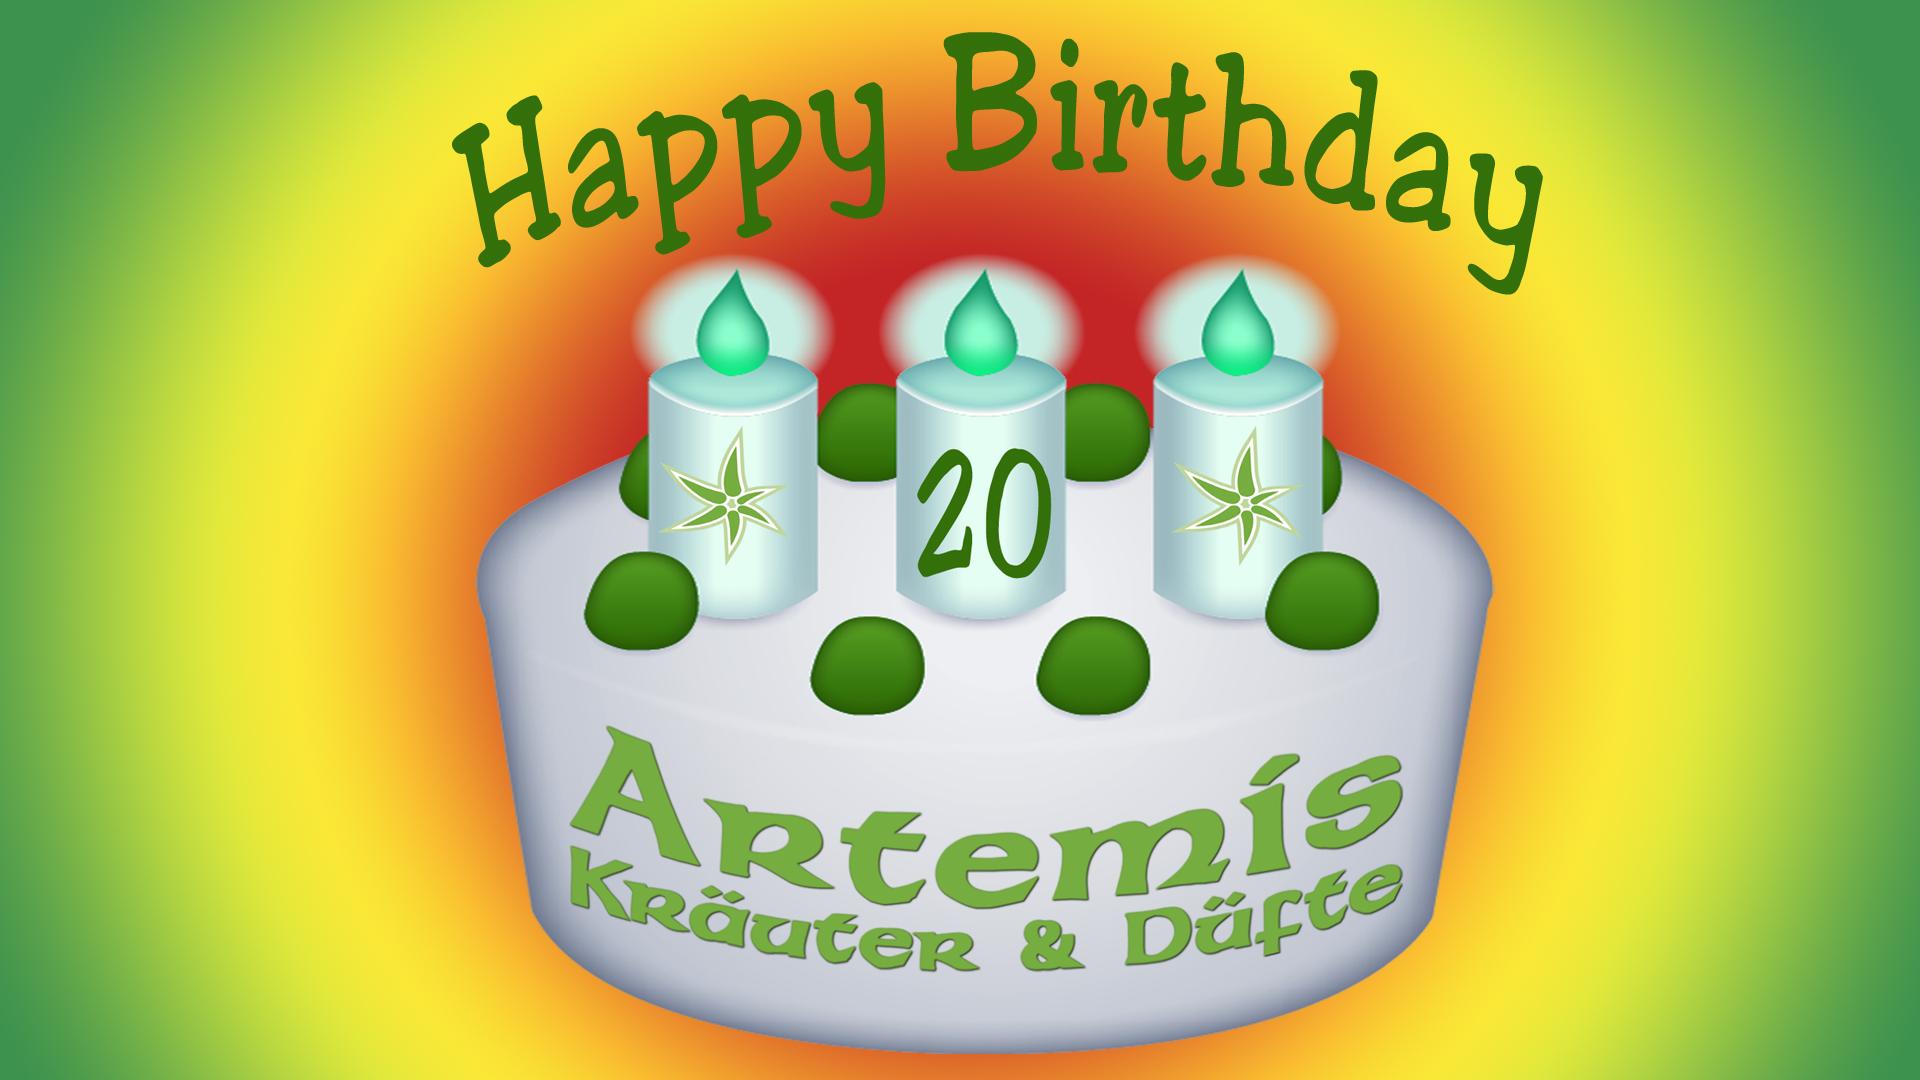 Artemis Kräuter und Düfte feiert 2019 sein 20 jähriges Jubiläum!